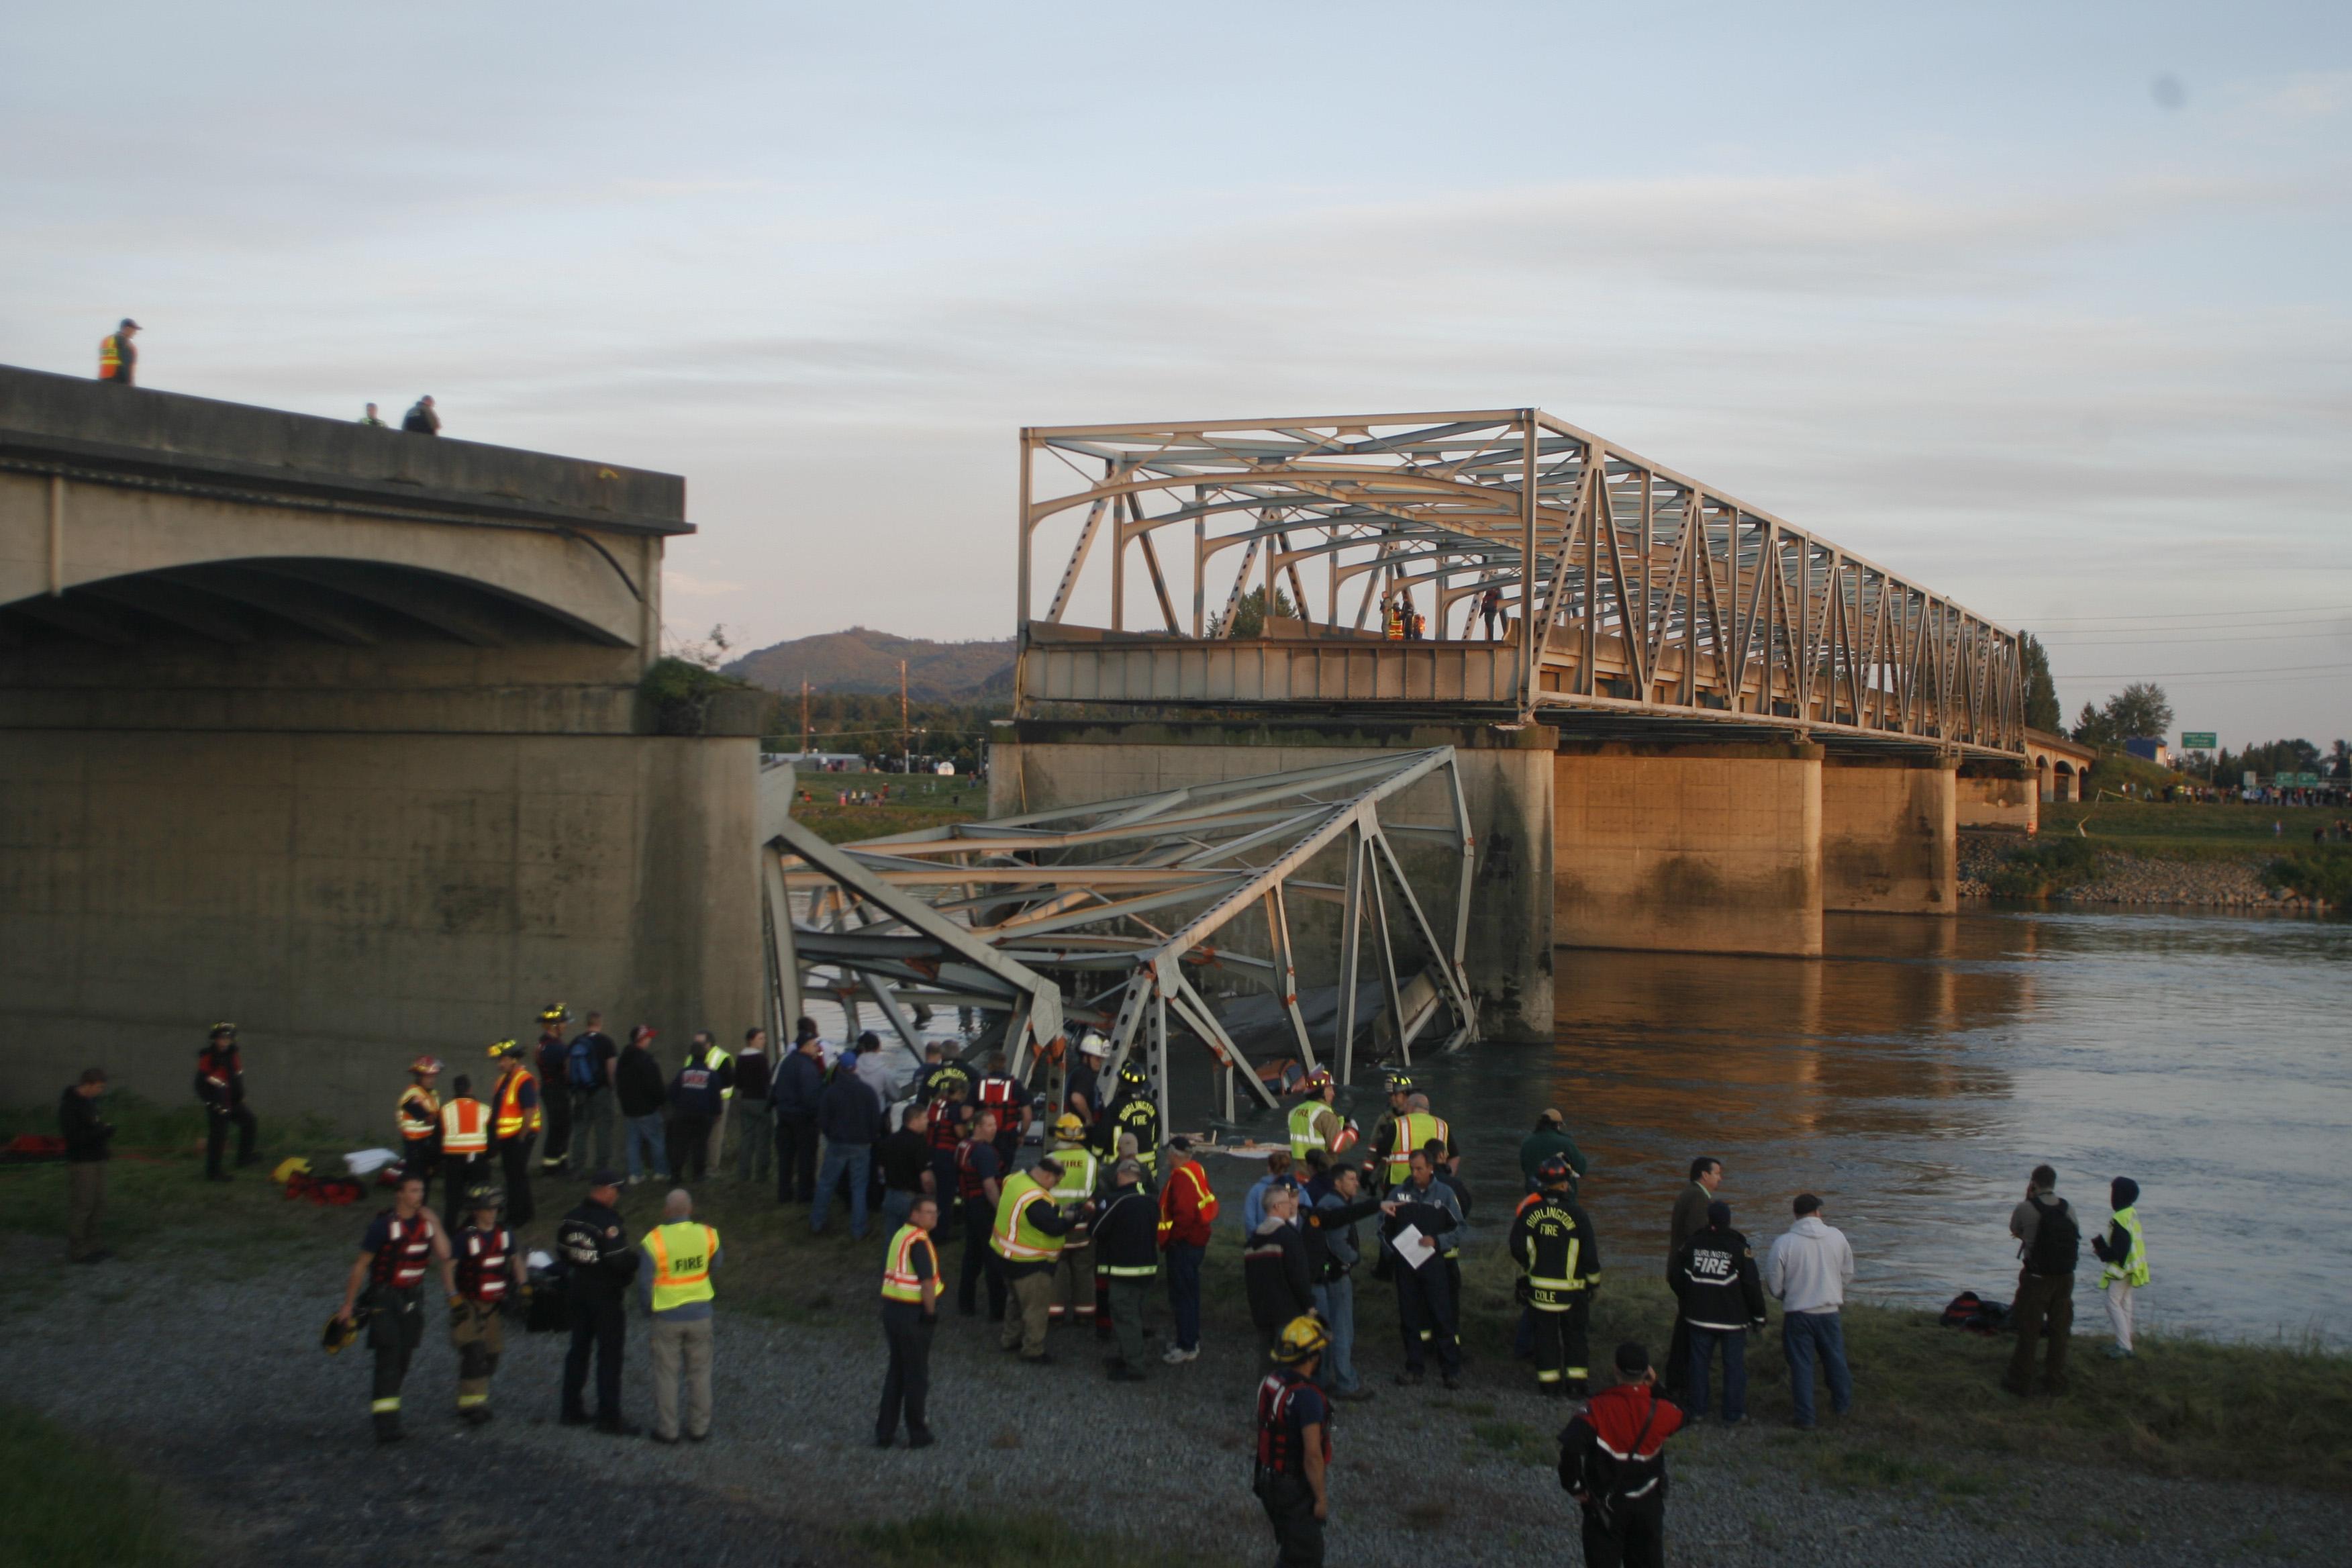 Mount Vernon Wa I 5 Bridge Collapse Caused By Truck